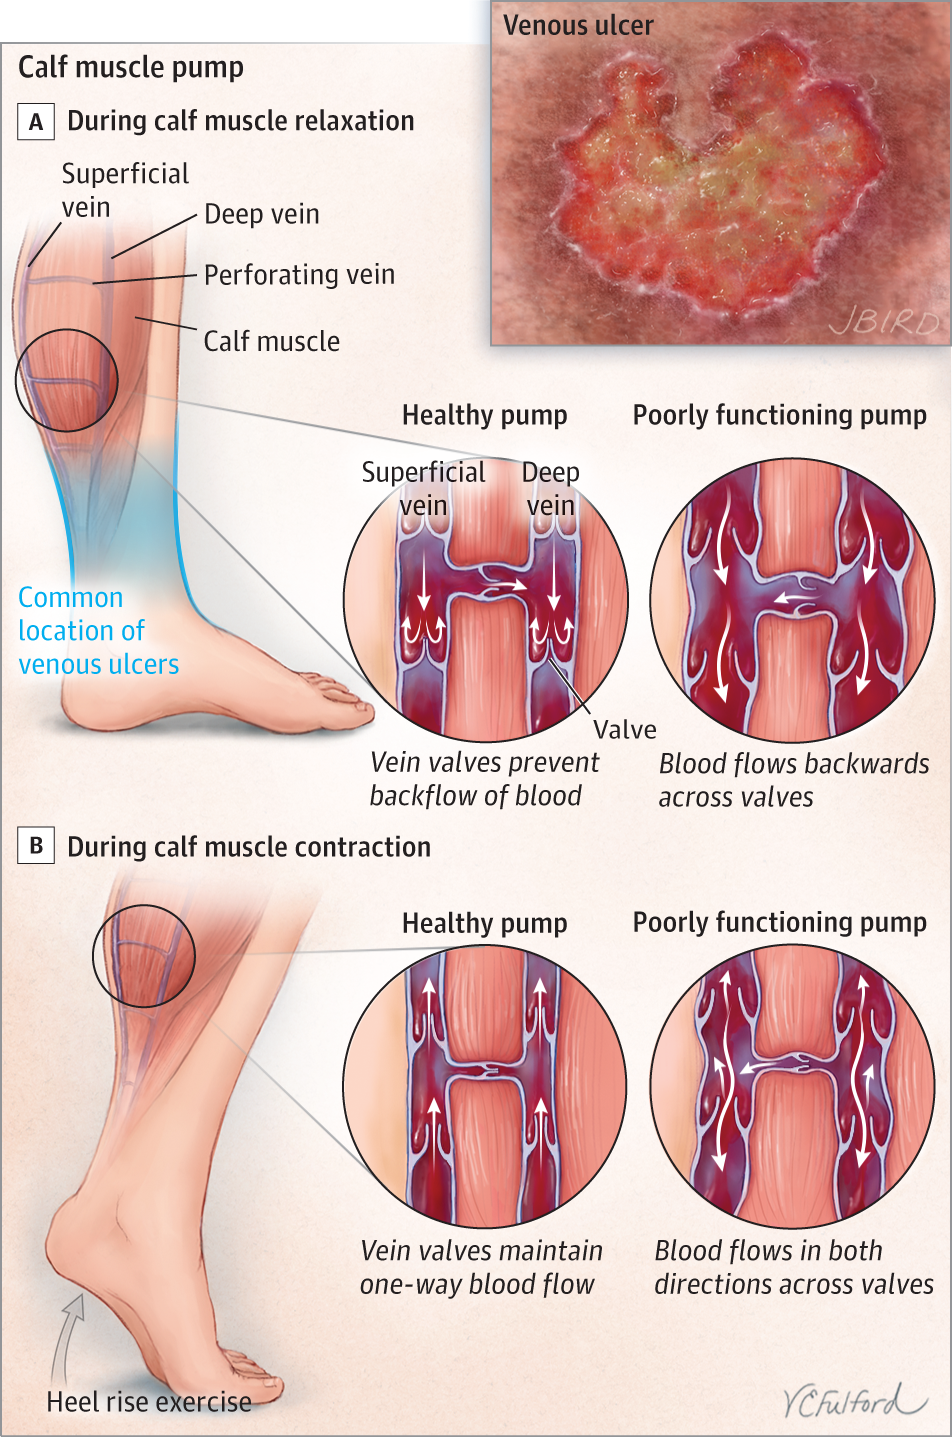 Venous Ulcers Dermatology Jama Dermatology Jama Network